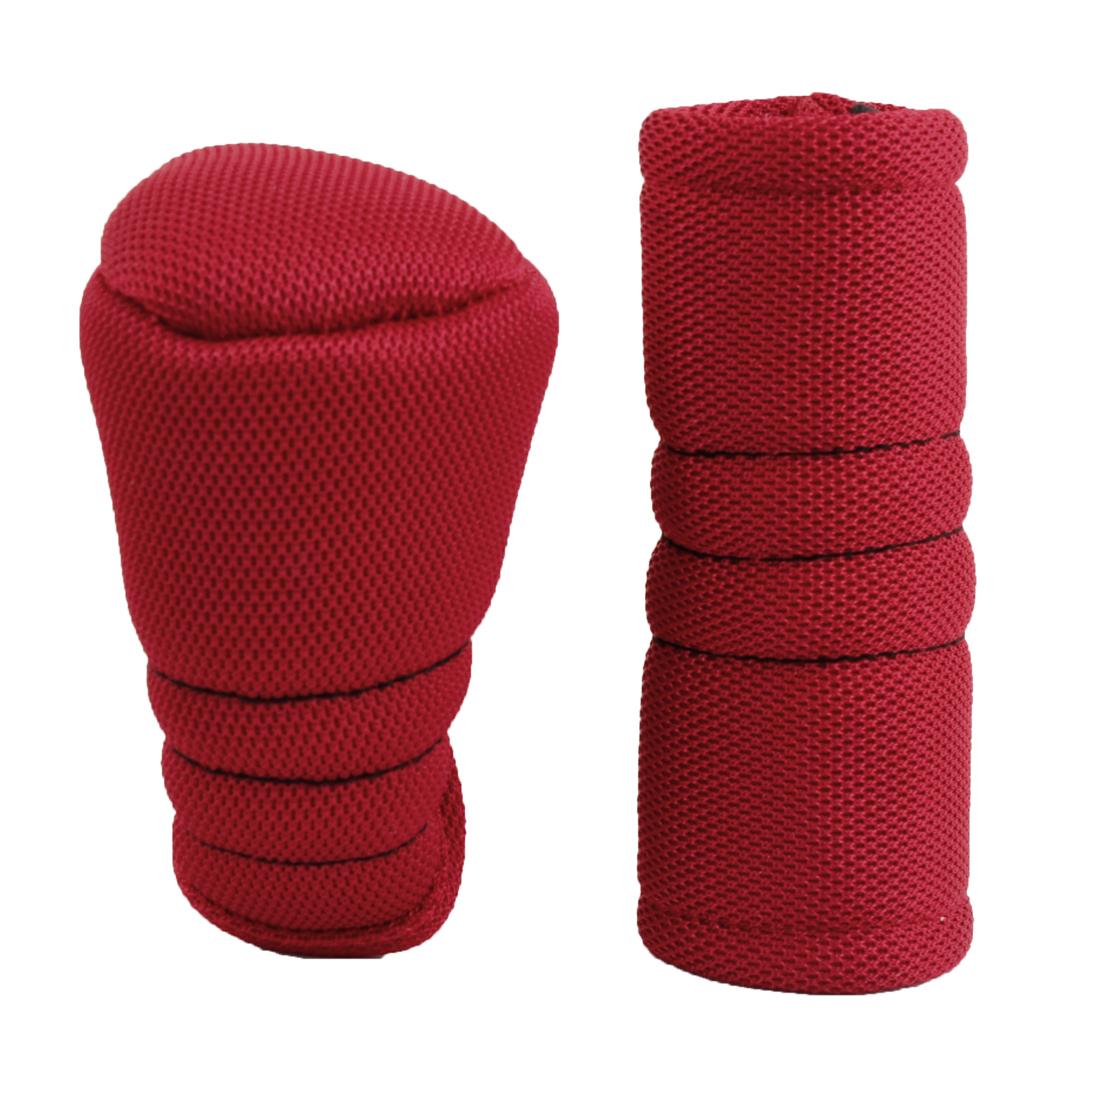 2pcs Zipper Car Gear Shift Knob Handbrake Cover Sleeve Red